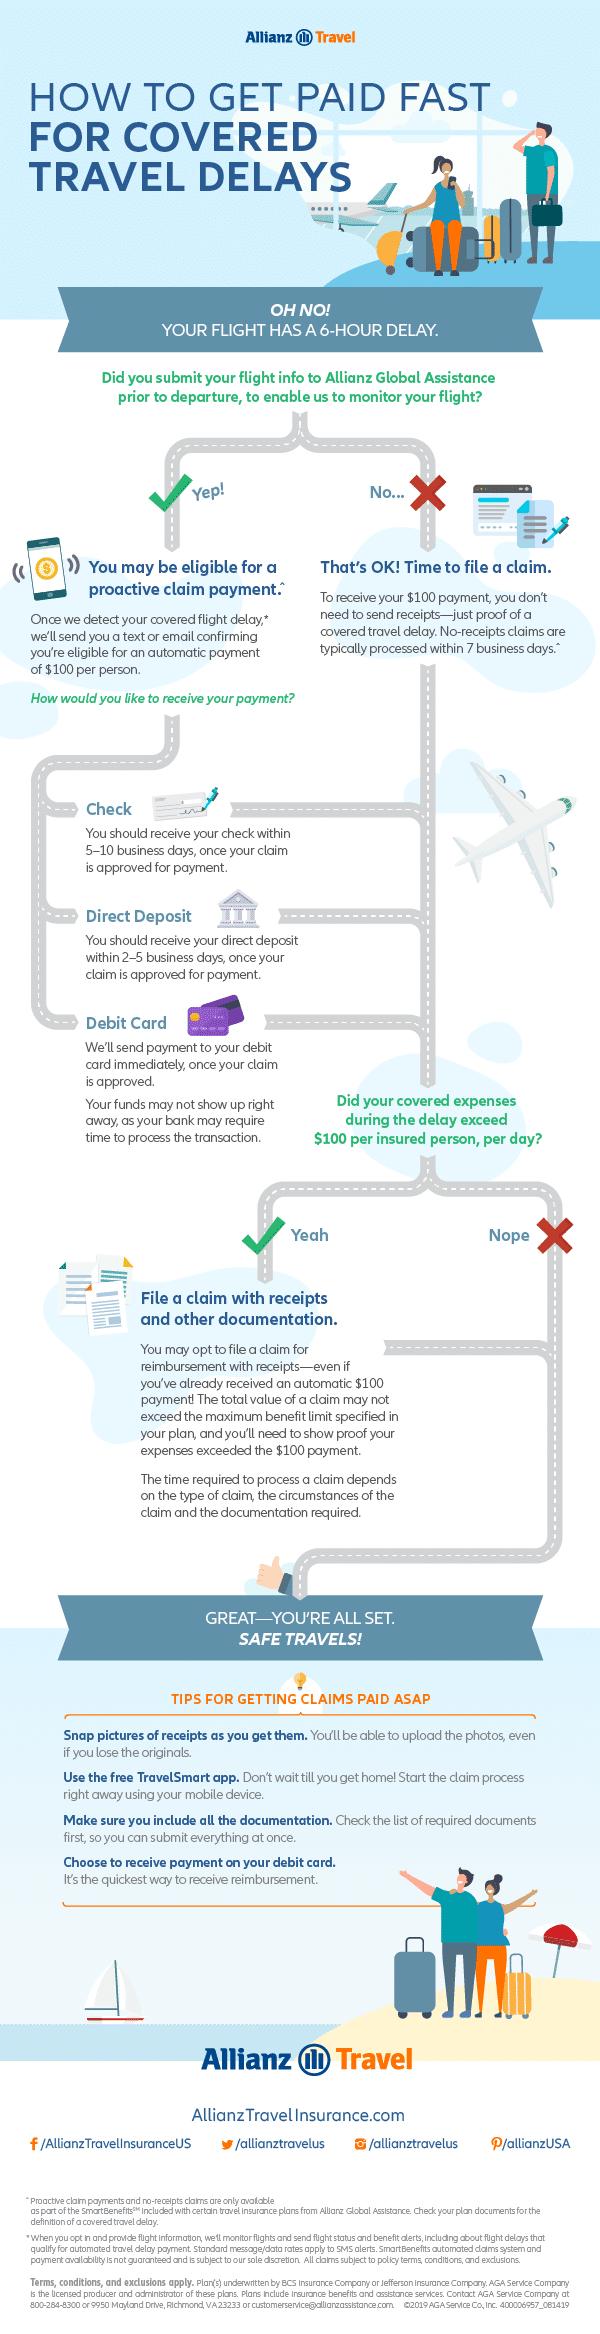 How Allianz SmartBenefits work